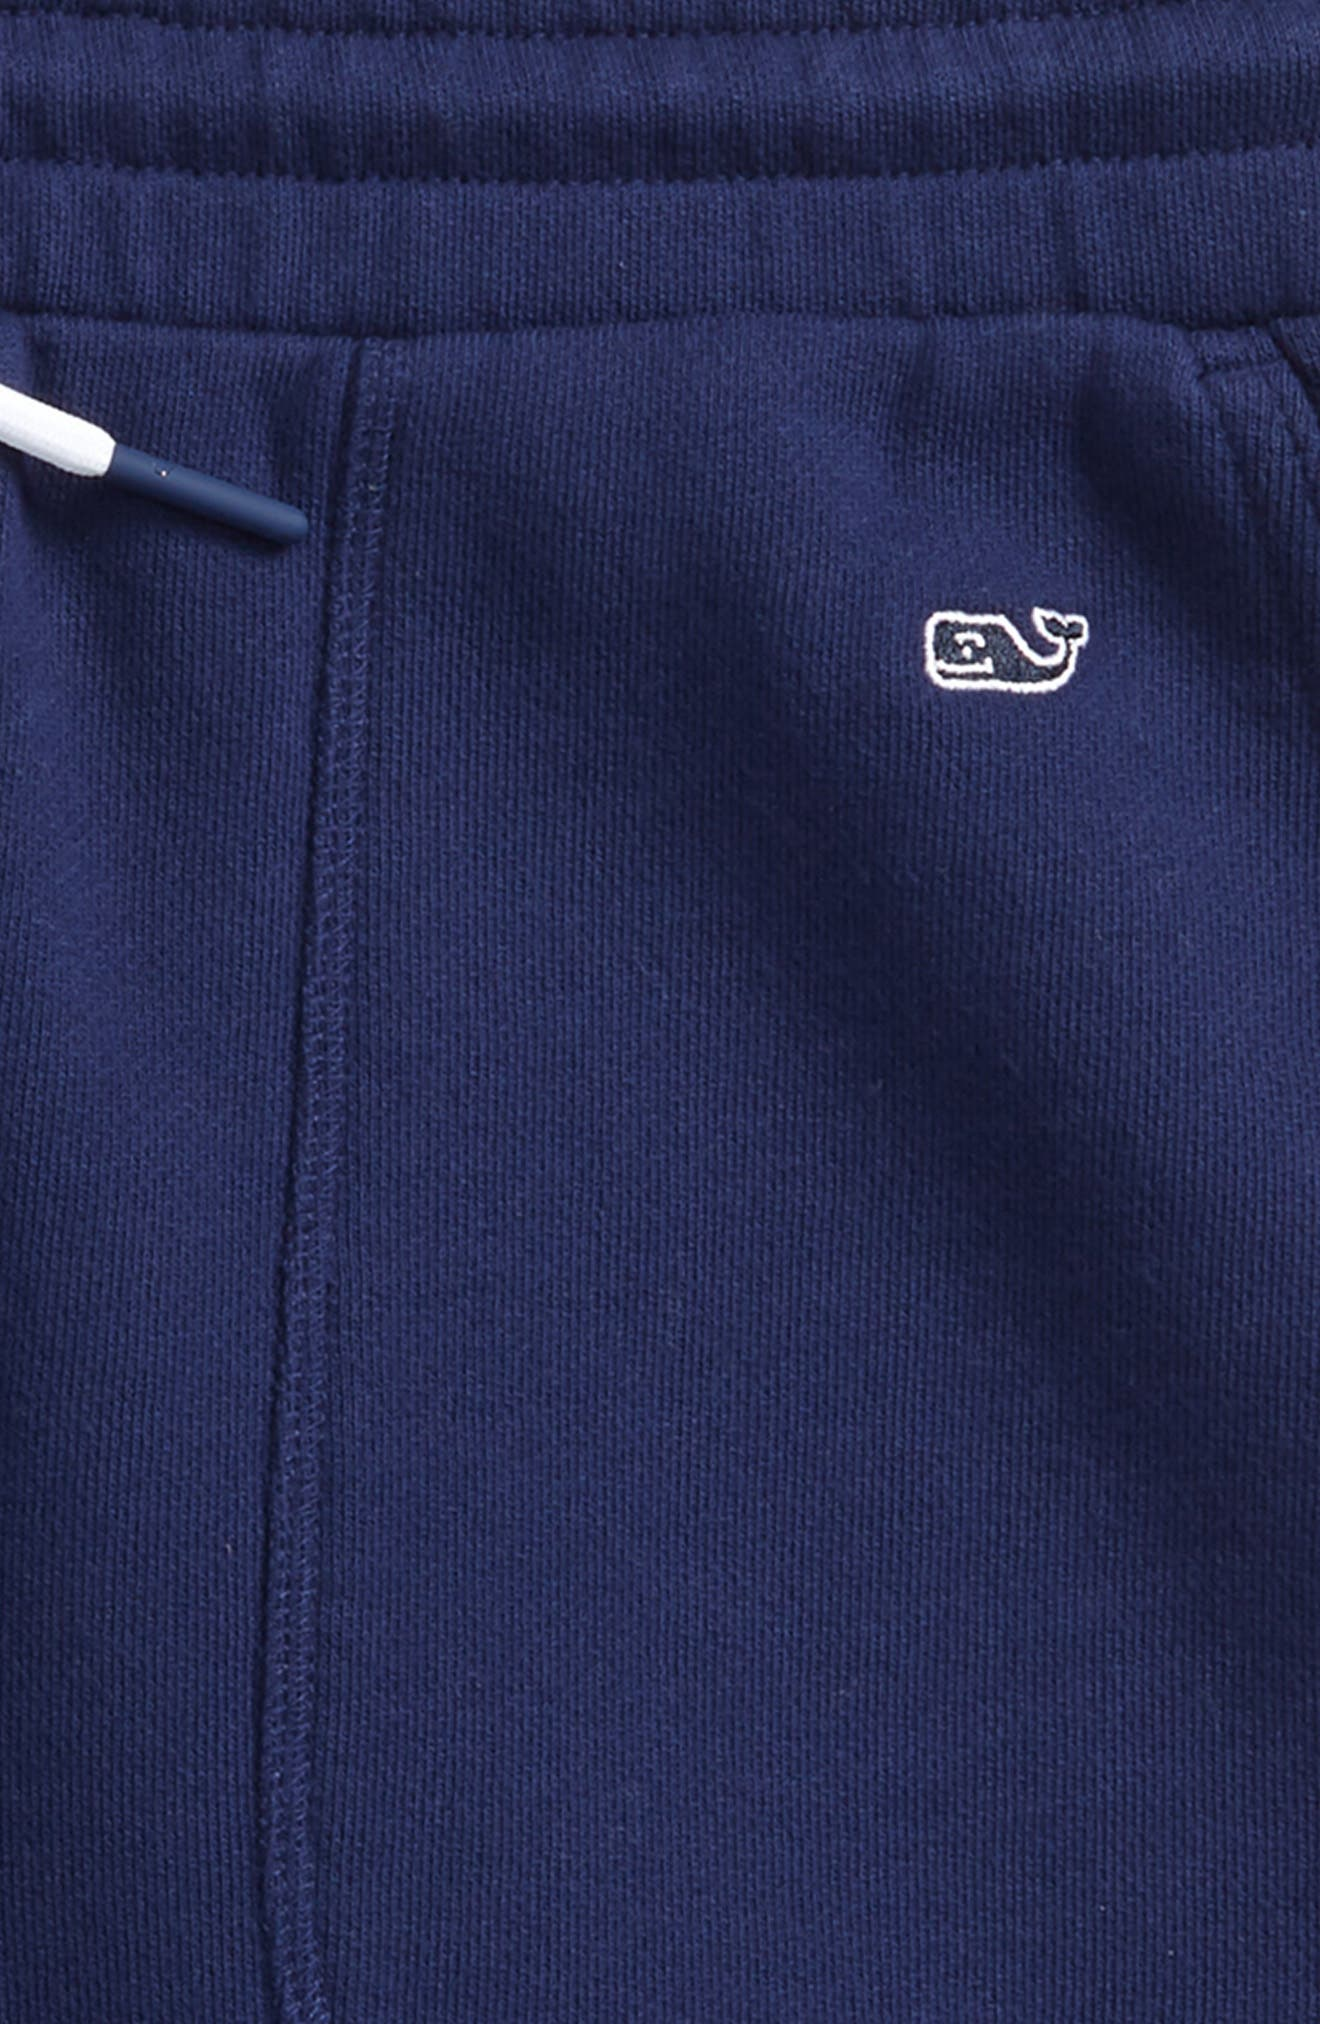 Garment Dyed Knit Shorts,                             Alternate thumbnail 2, color,                             Deep Bay